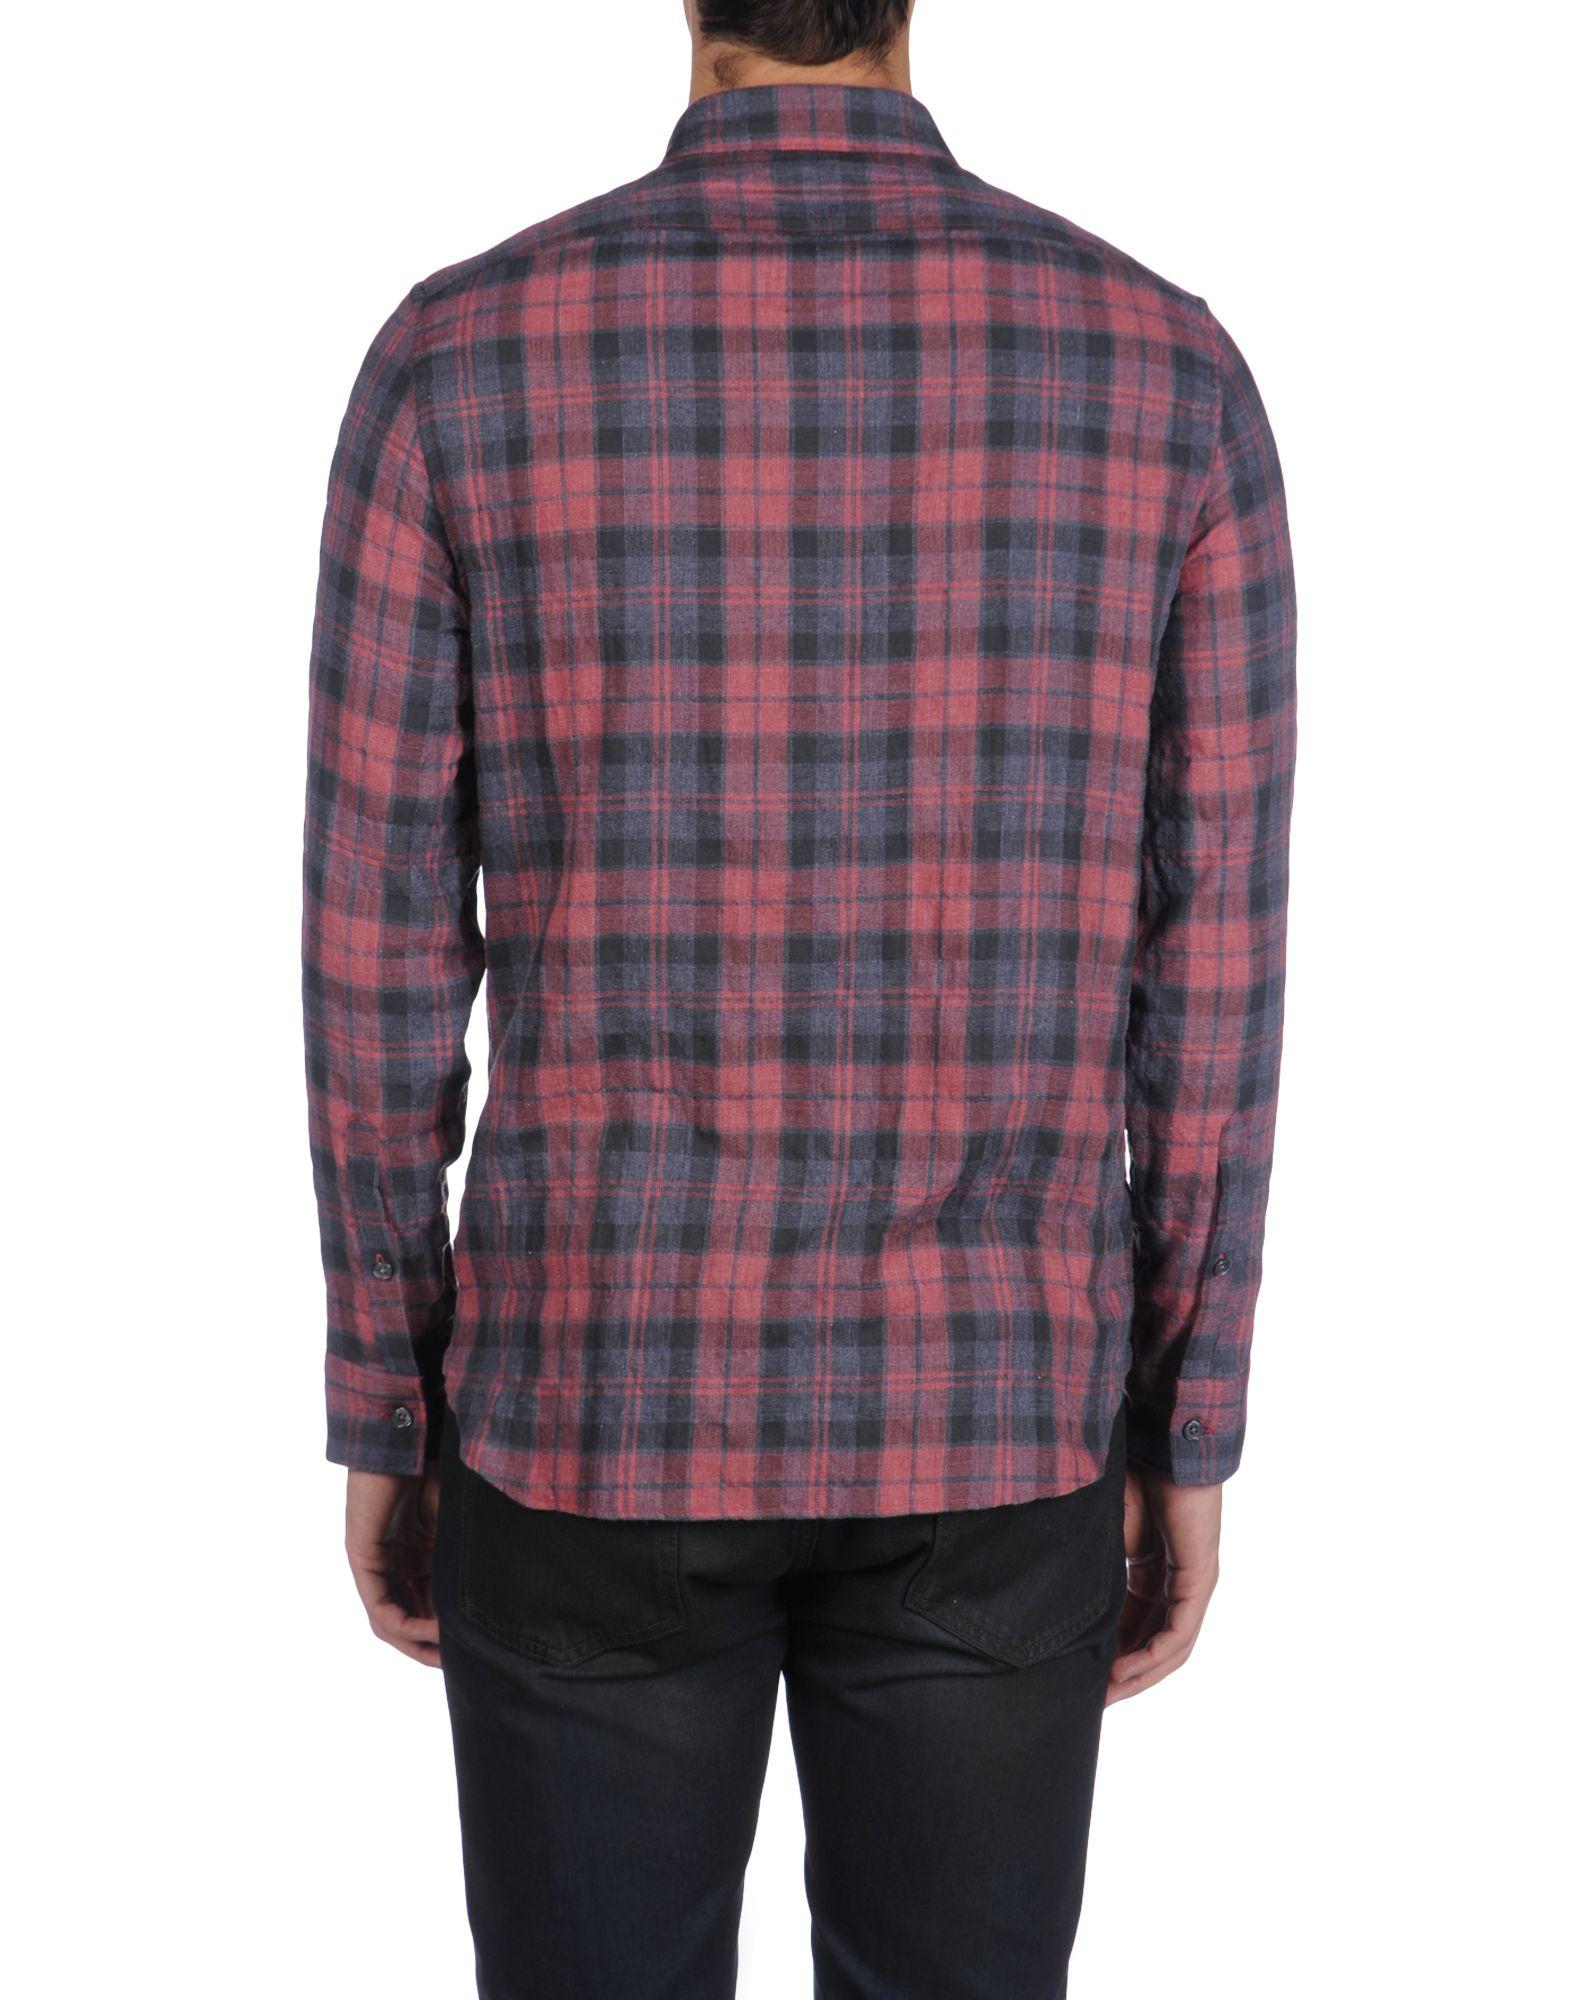 Lyst edun long sleeve shirt in pink for men for Mens pink long sleeve shirt